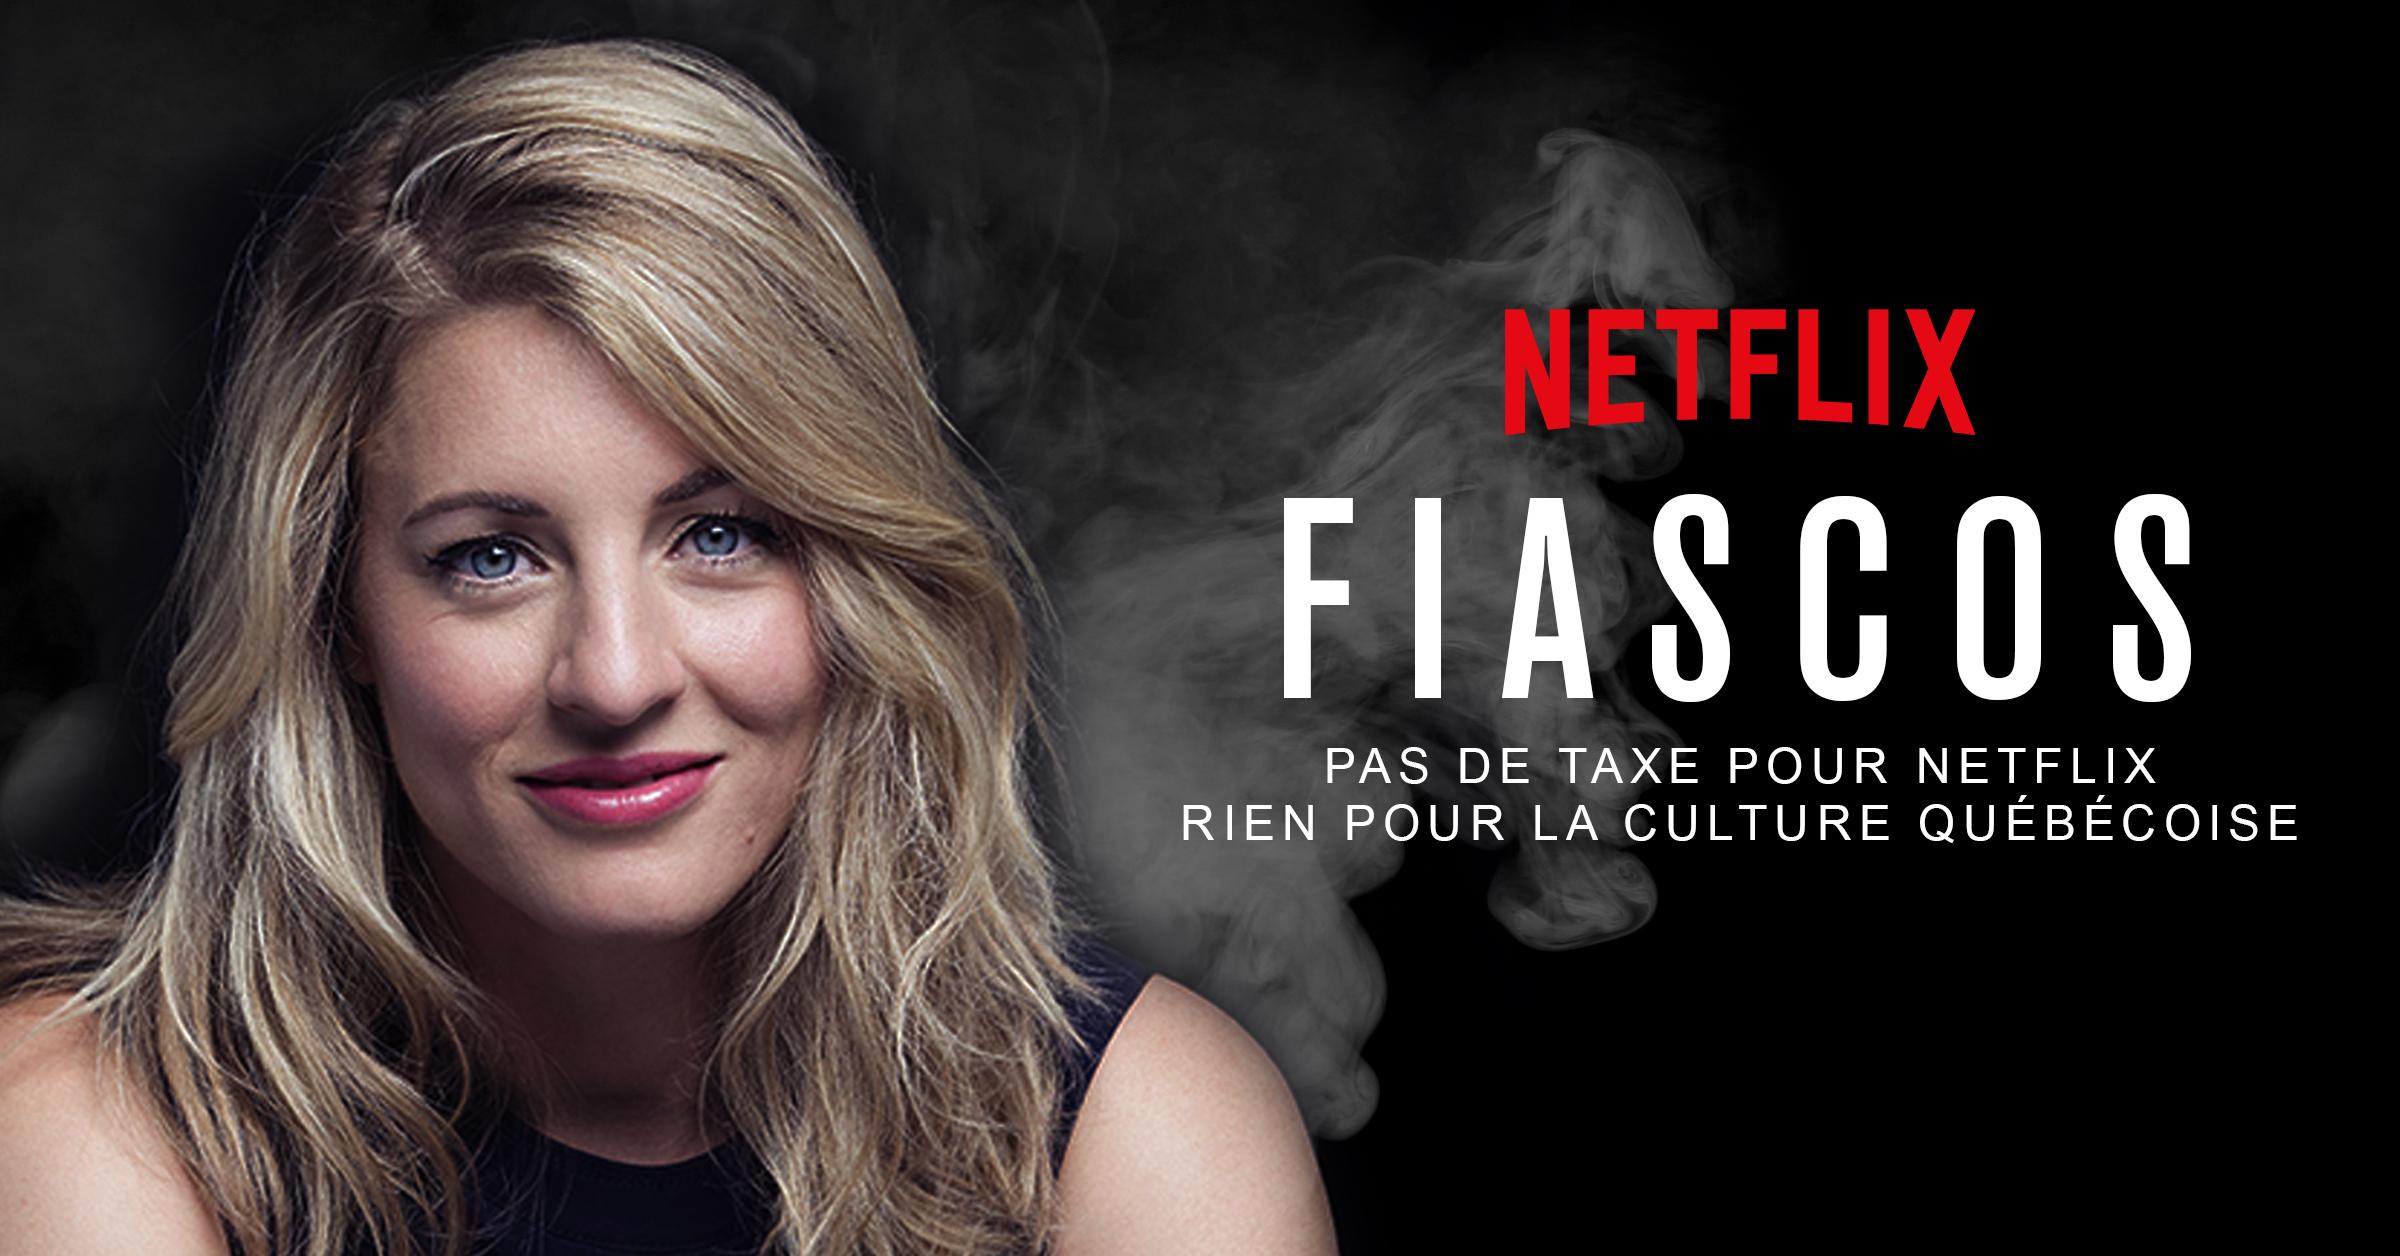 Netflix_Fiascos_FR.jpg